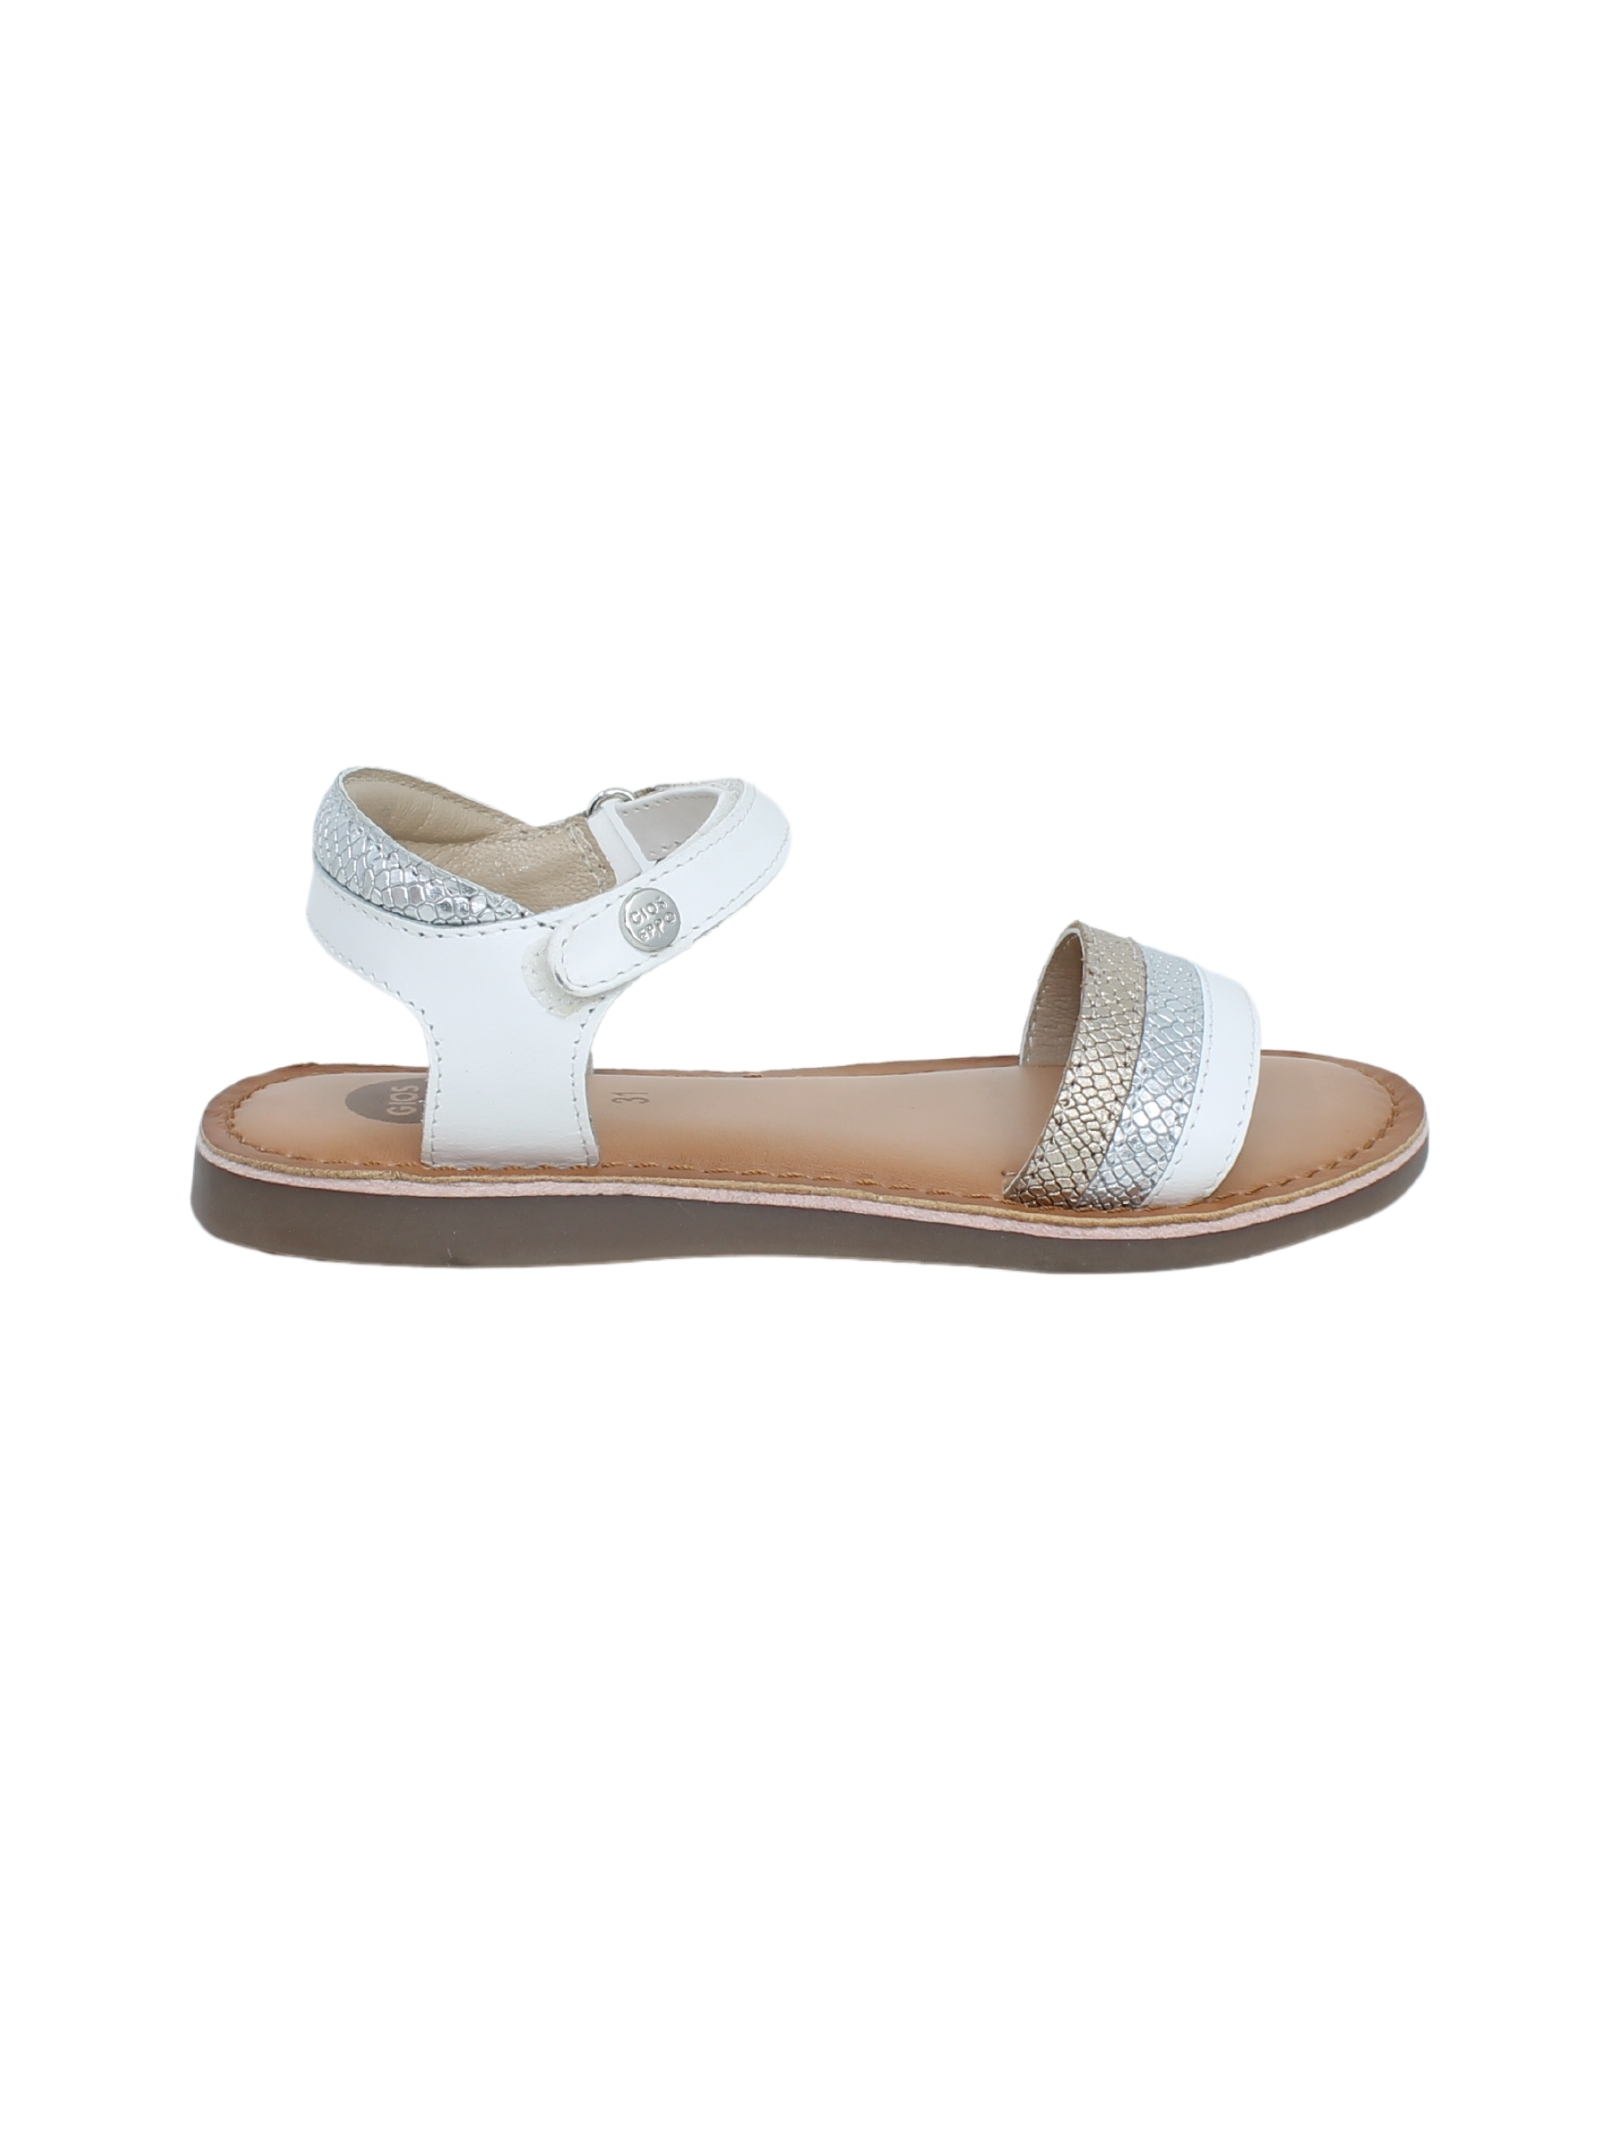 GIOSEPPO KIDS | Sandals | 62989BIANCO